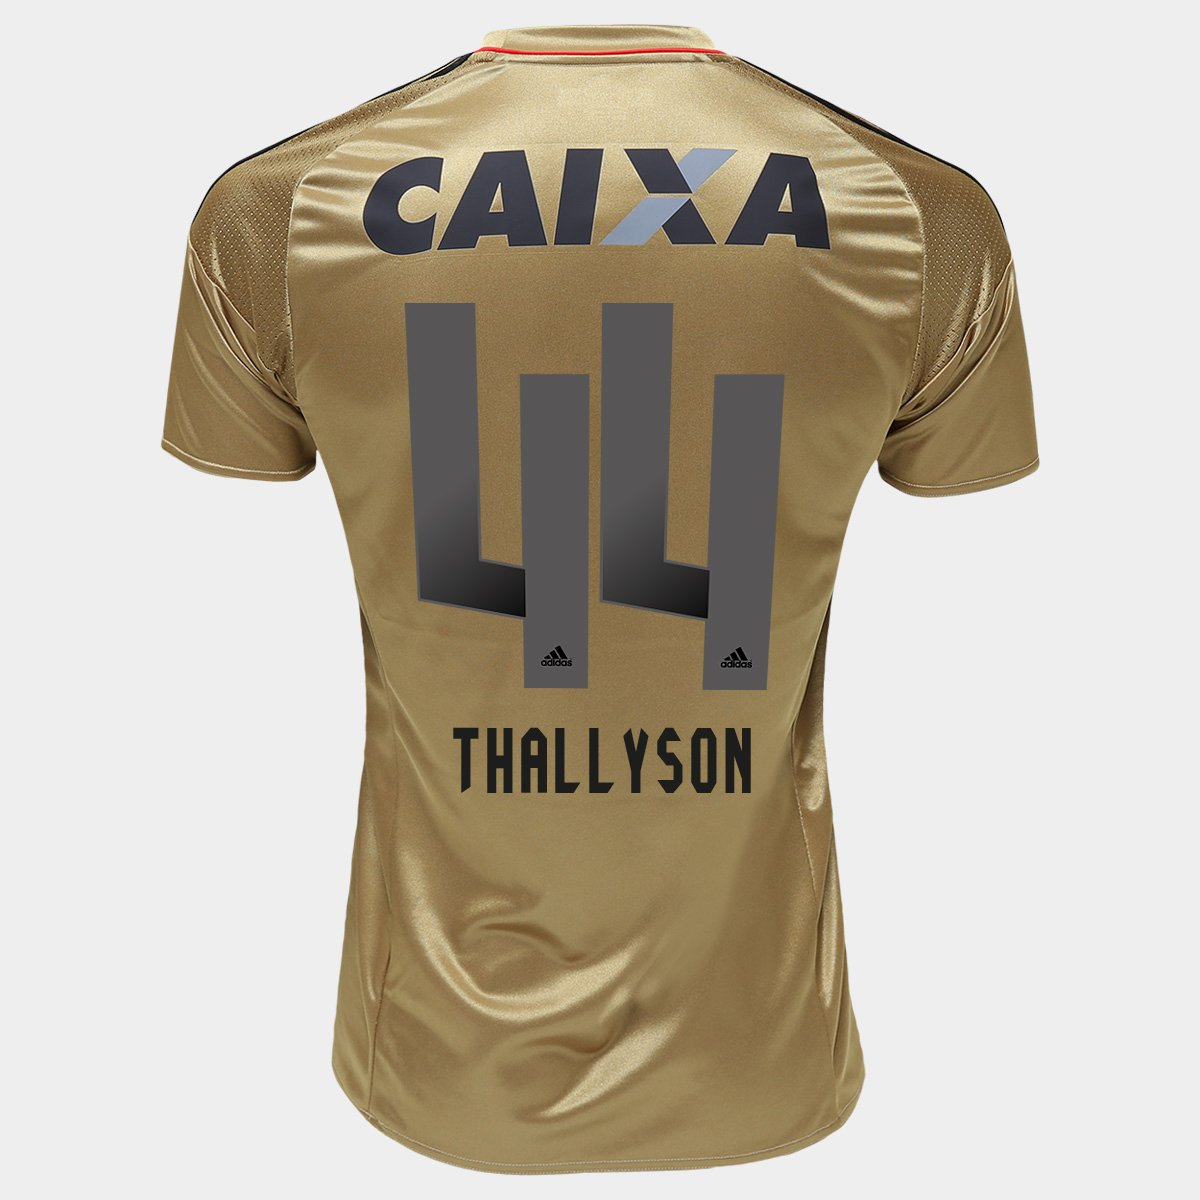 Camisa Adidas Sport Recife III 2016 nº 44 - Thallyson - Compre Agora ... 9beea80b5fc98